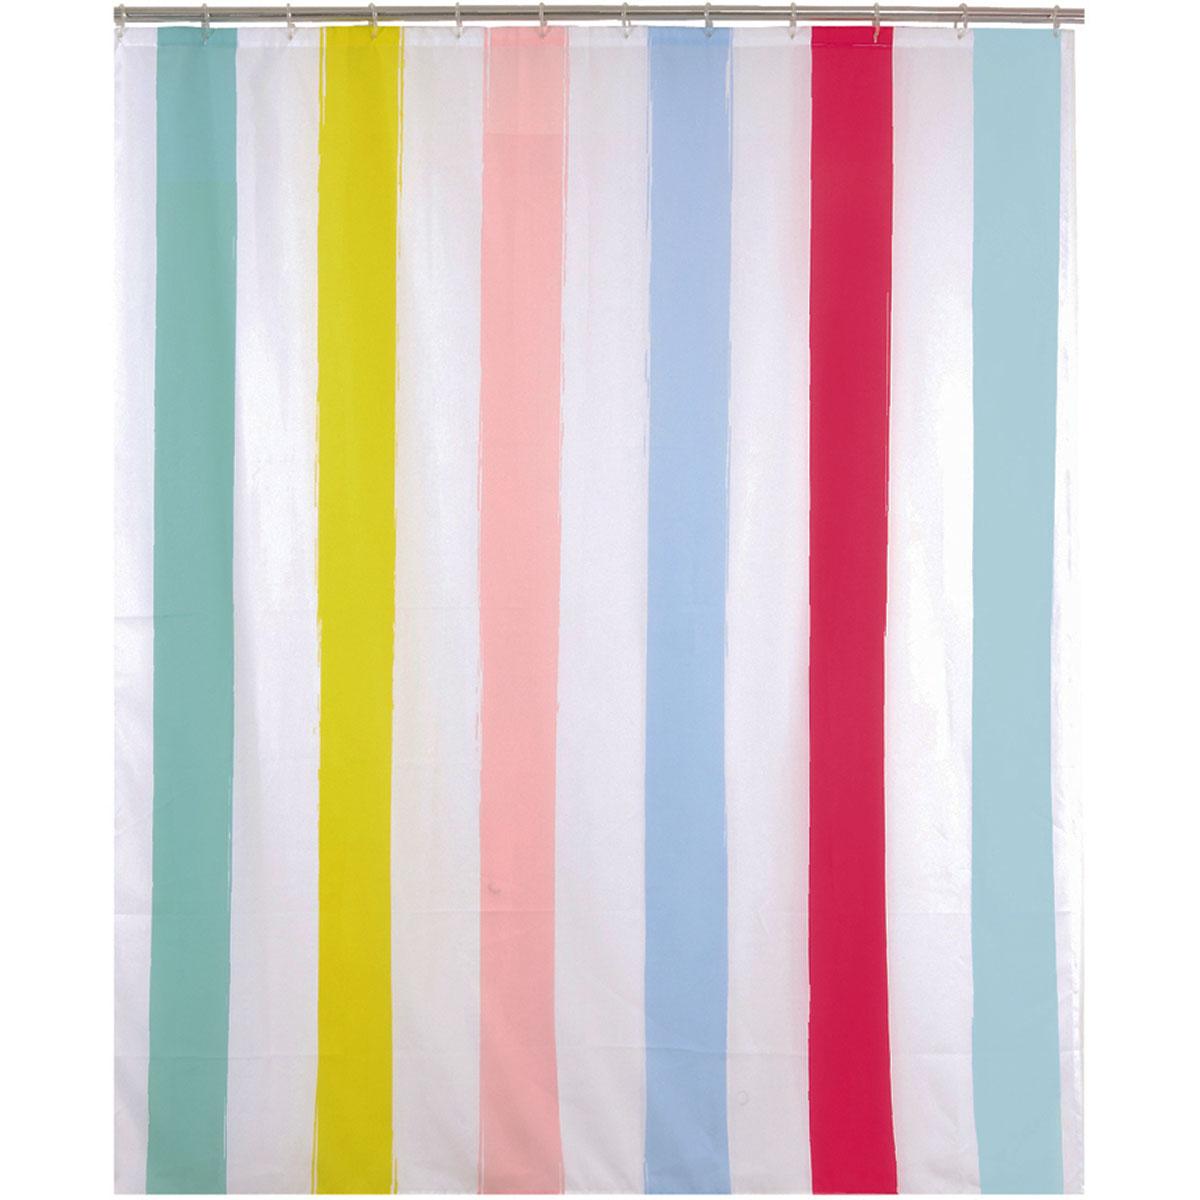 Rideau de douche bayadère polyester multicolore 200x180